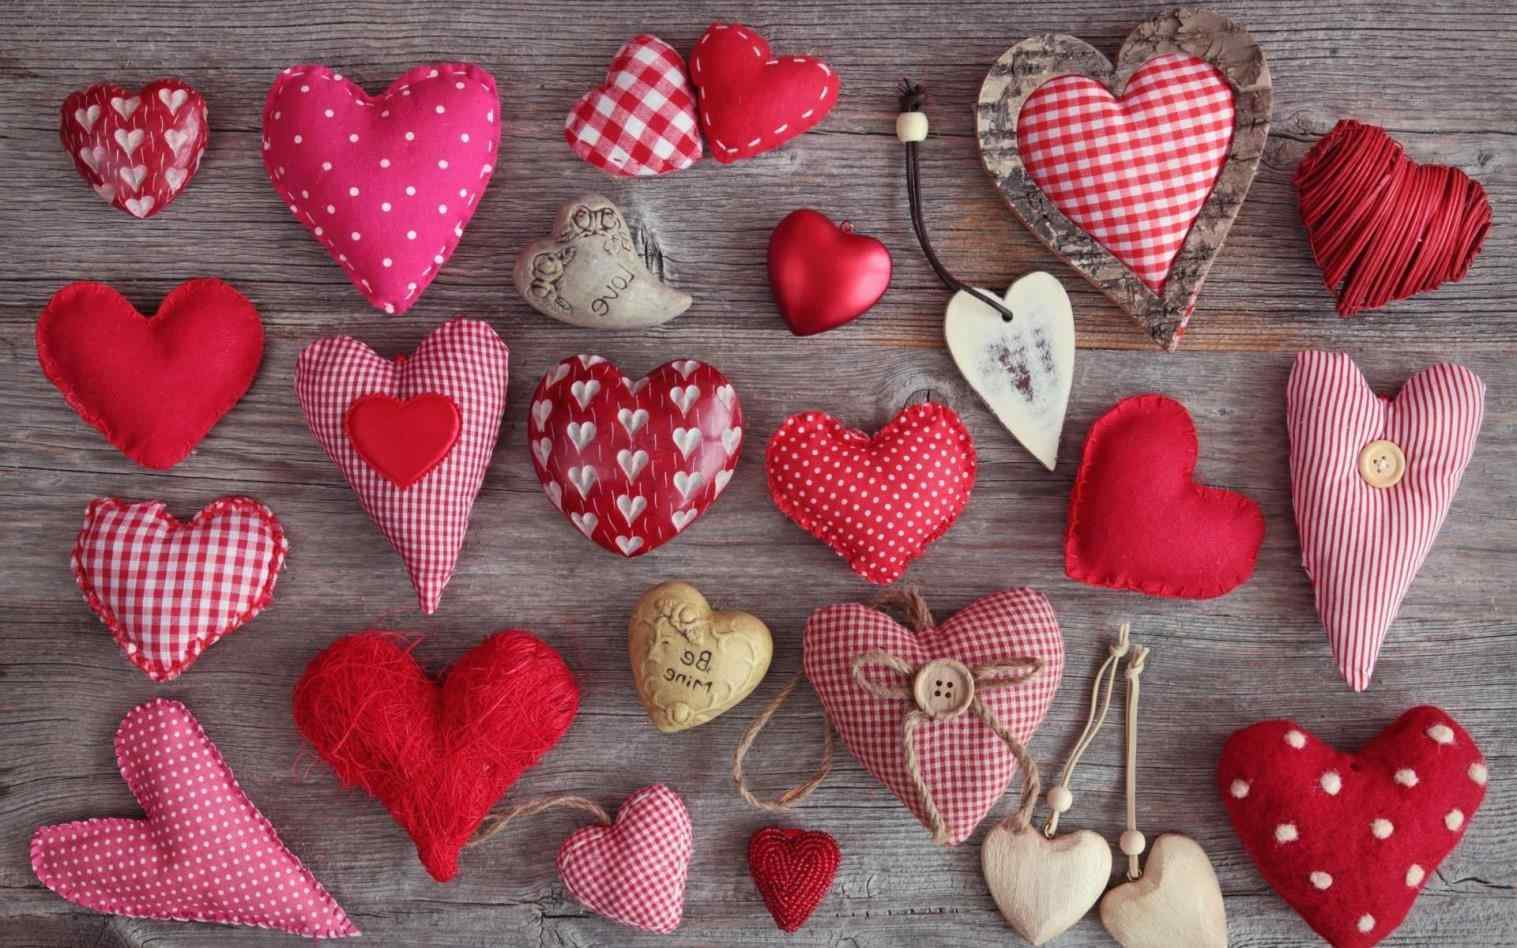 Vintage Valentine Desktop Wallpapers   Top Vintage Valentine 1517x948